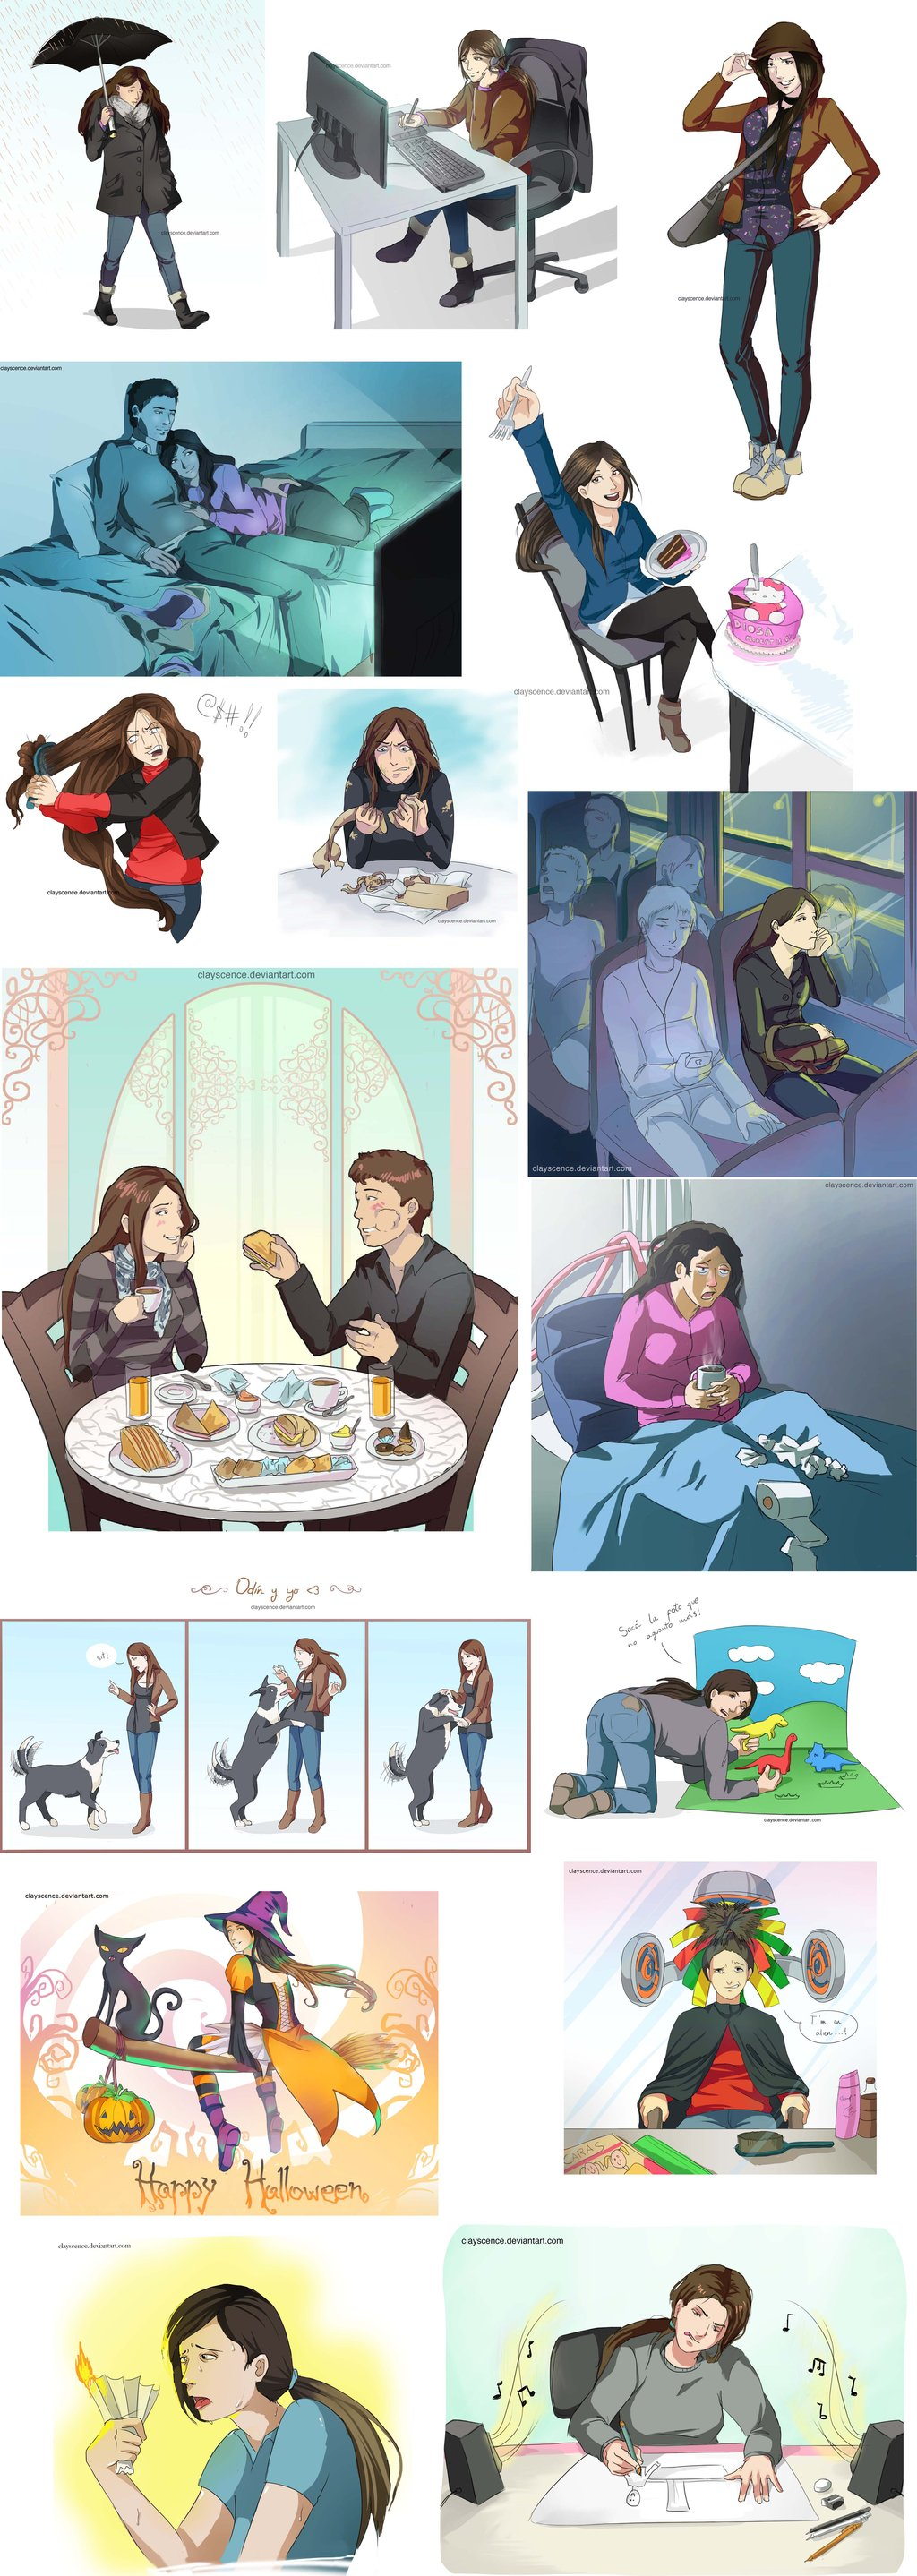 Facebook sketches